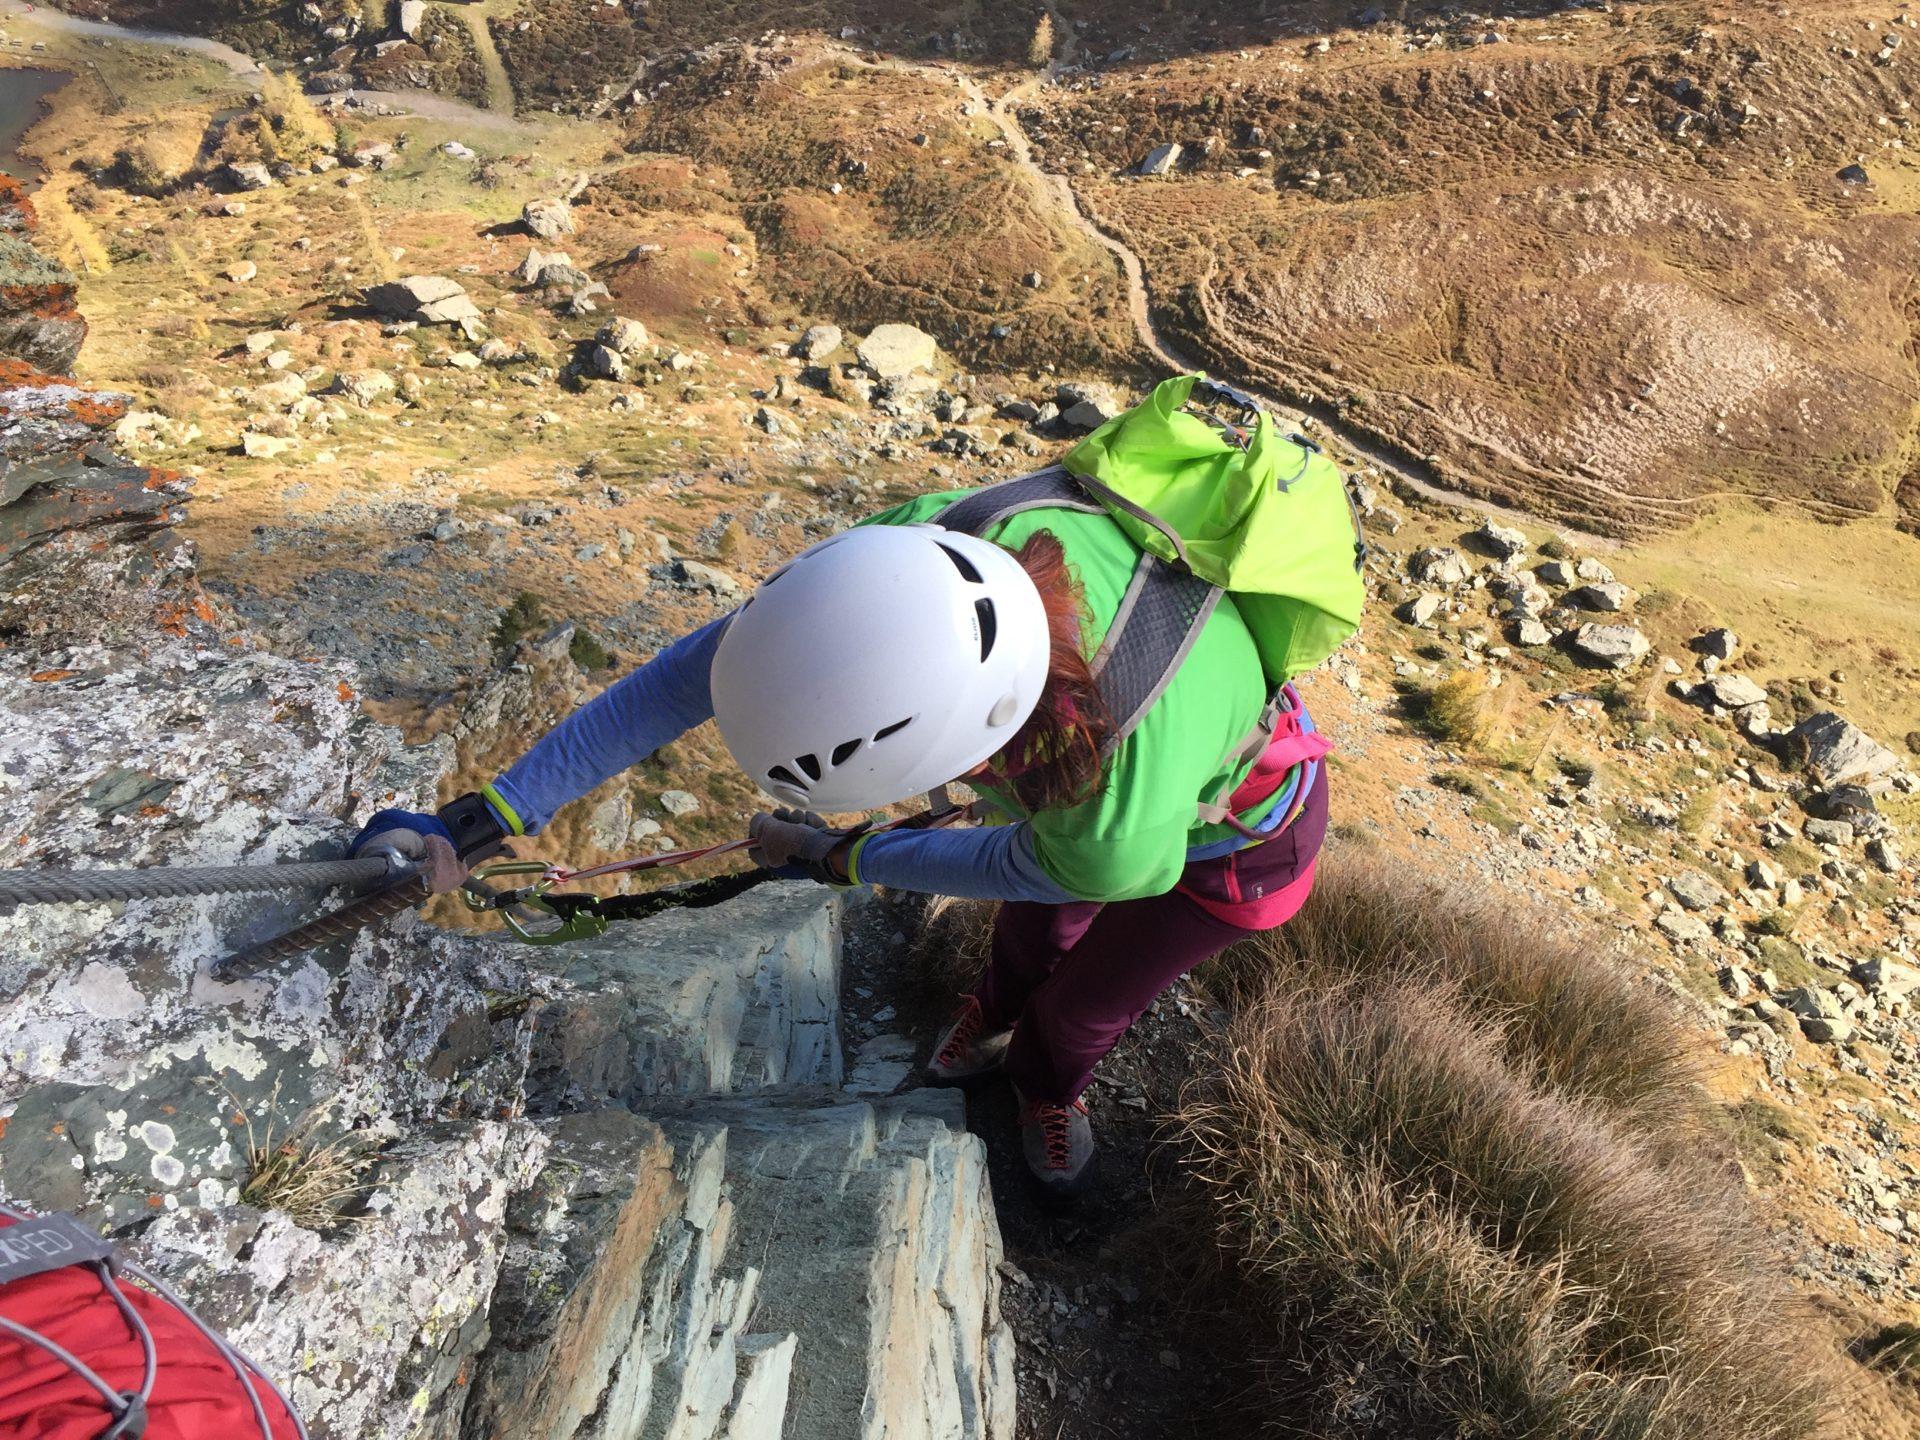 Klettersteig Falkert : Falken klettersteig bergsteigen